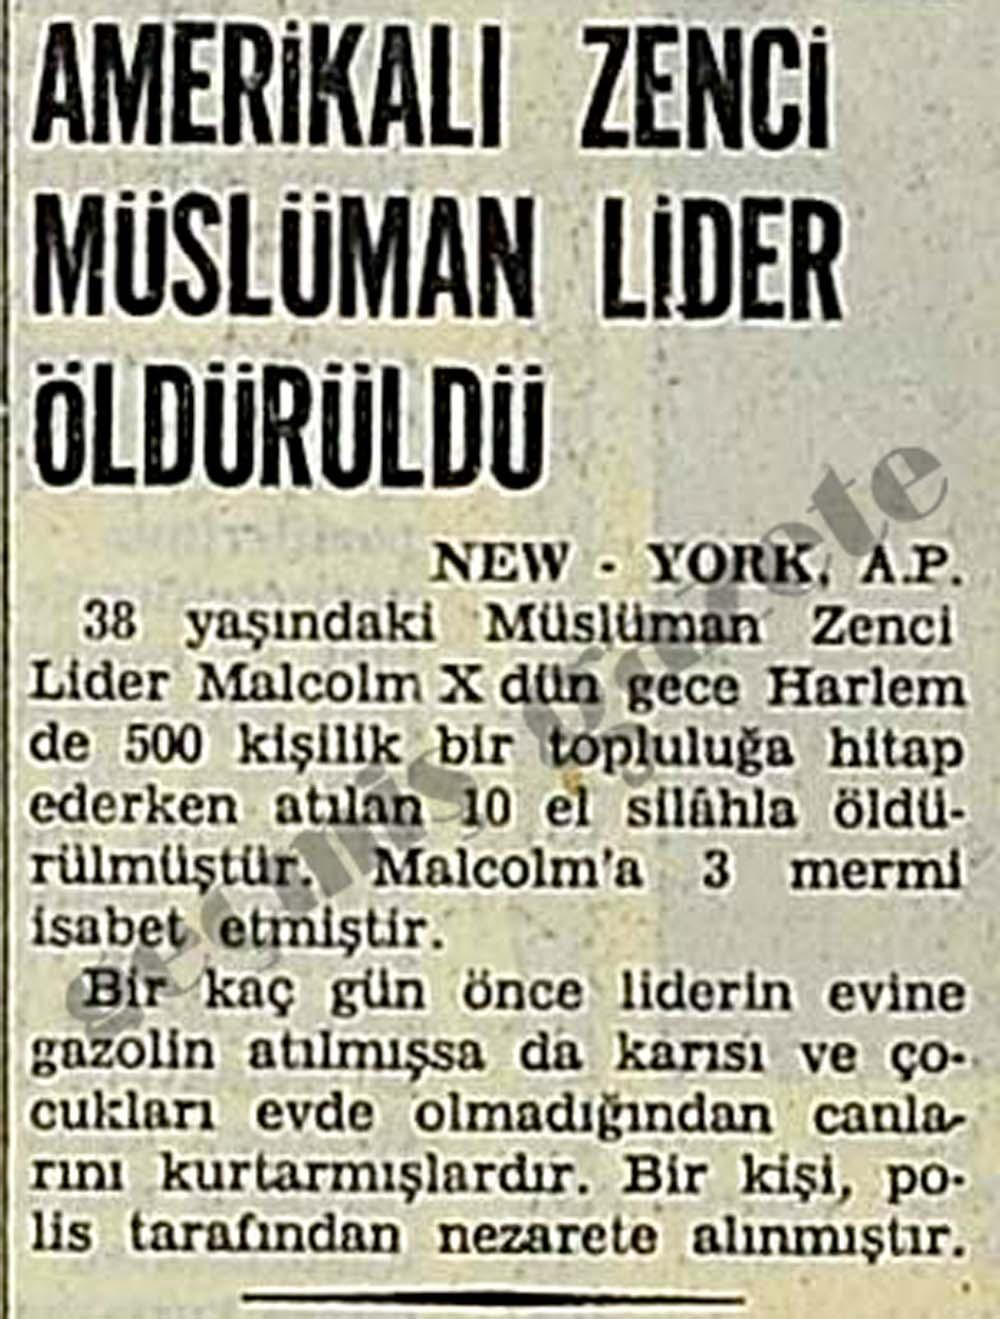 Amerikalı Zenci Müslüman Lider Malcolm X öldürüldü